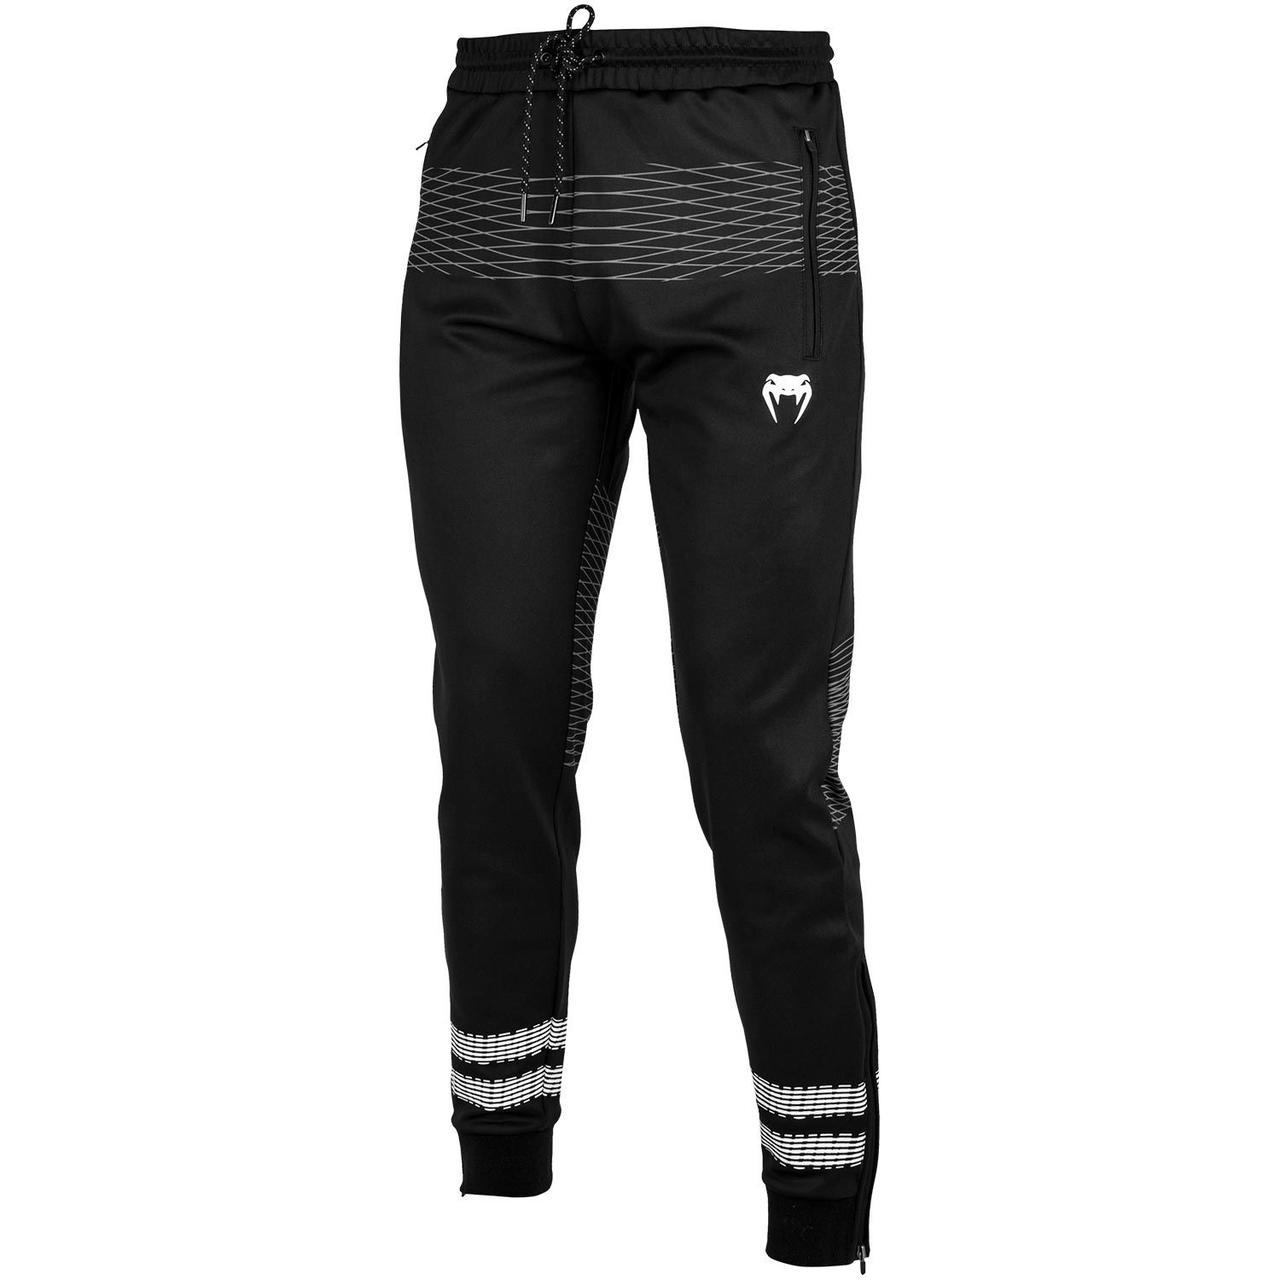 Спортивные штаны Venum Club 182 Joggings Black